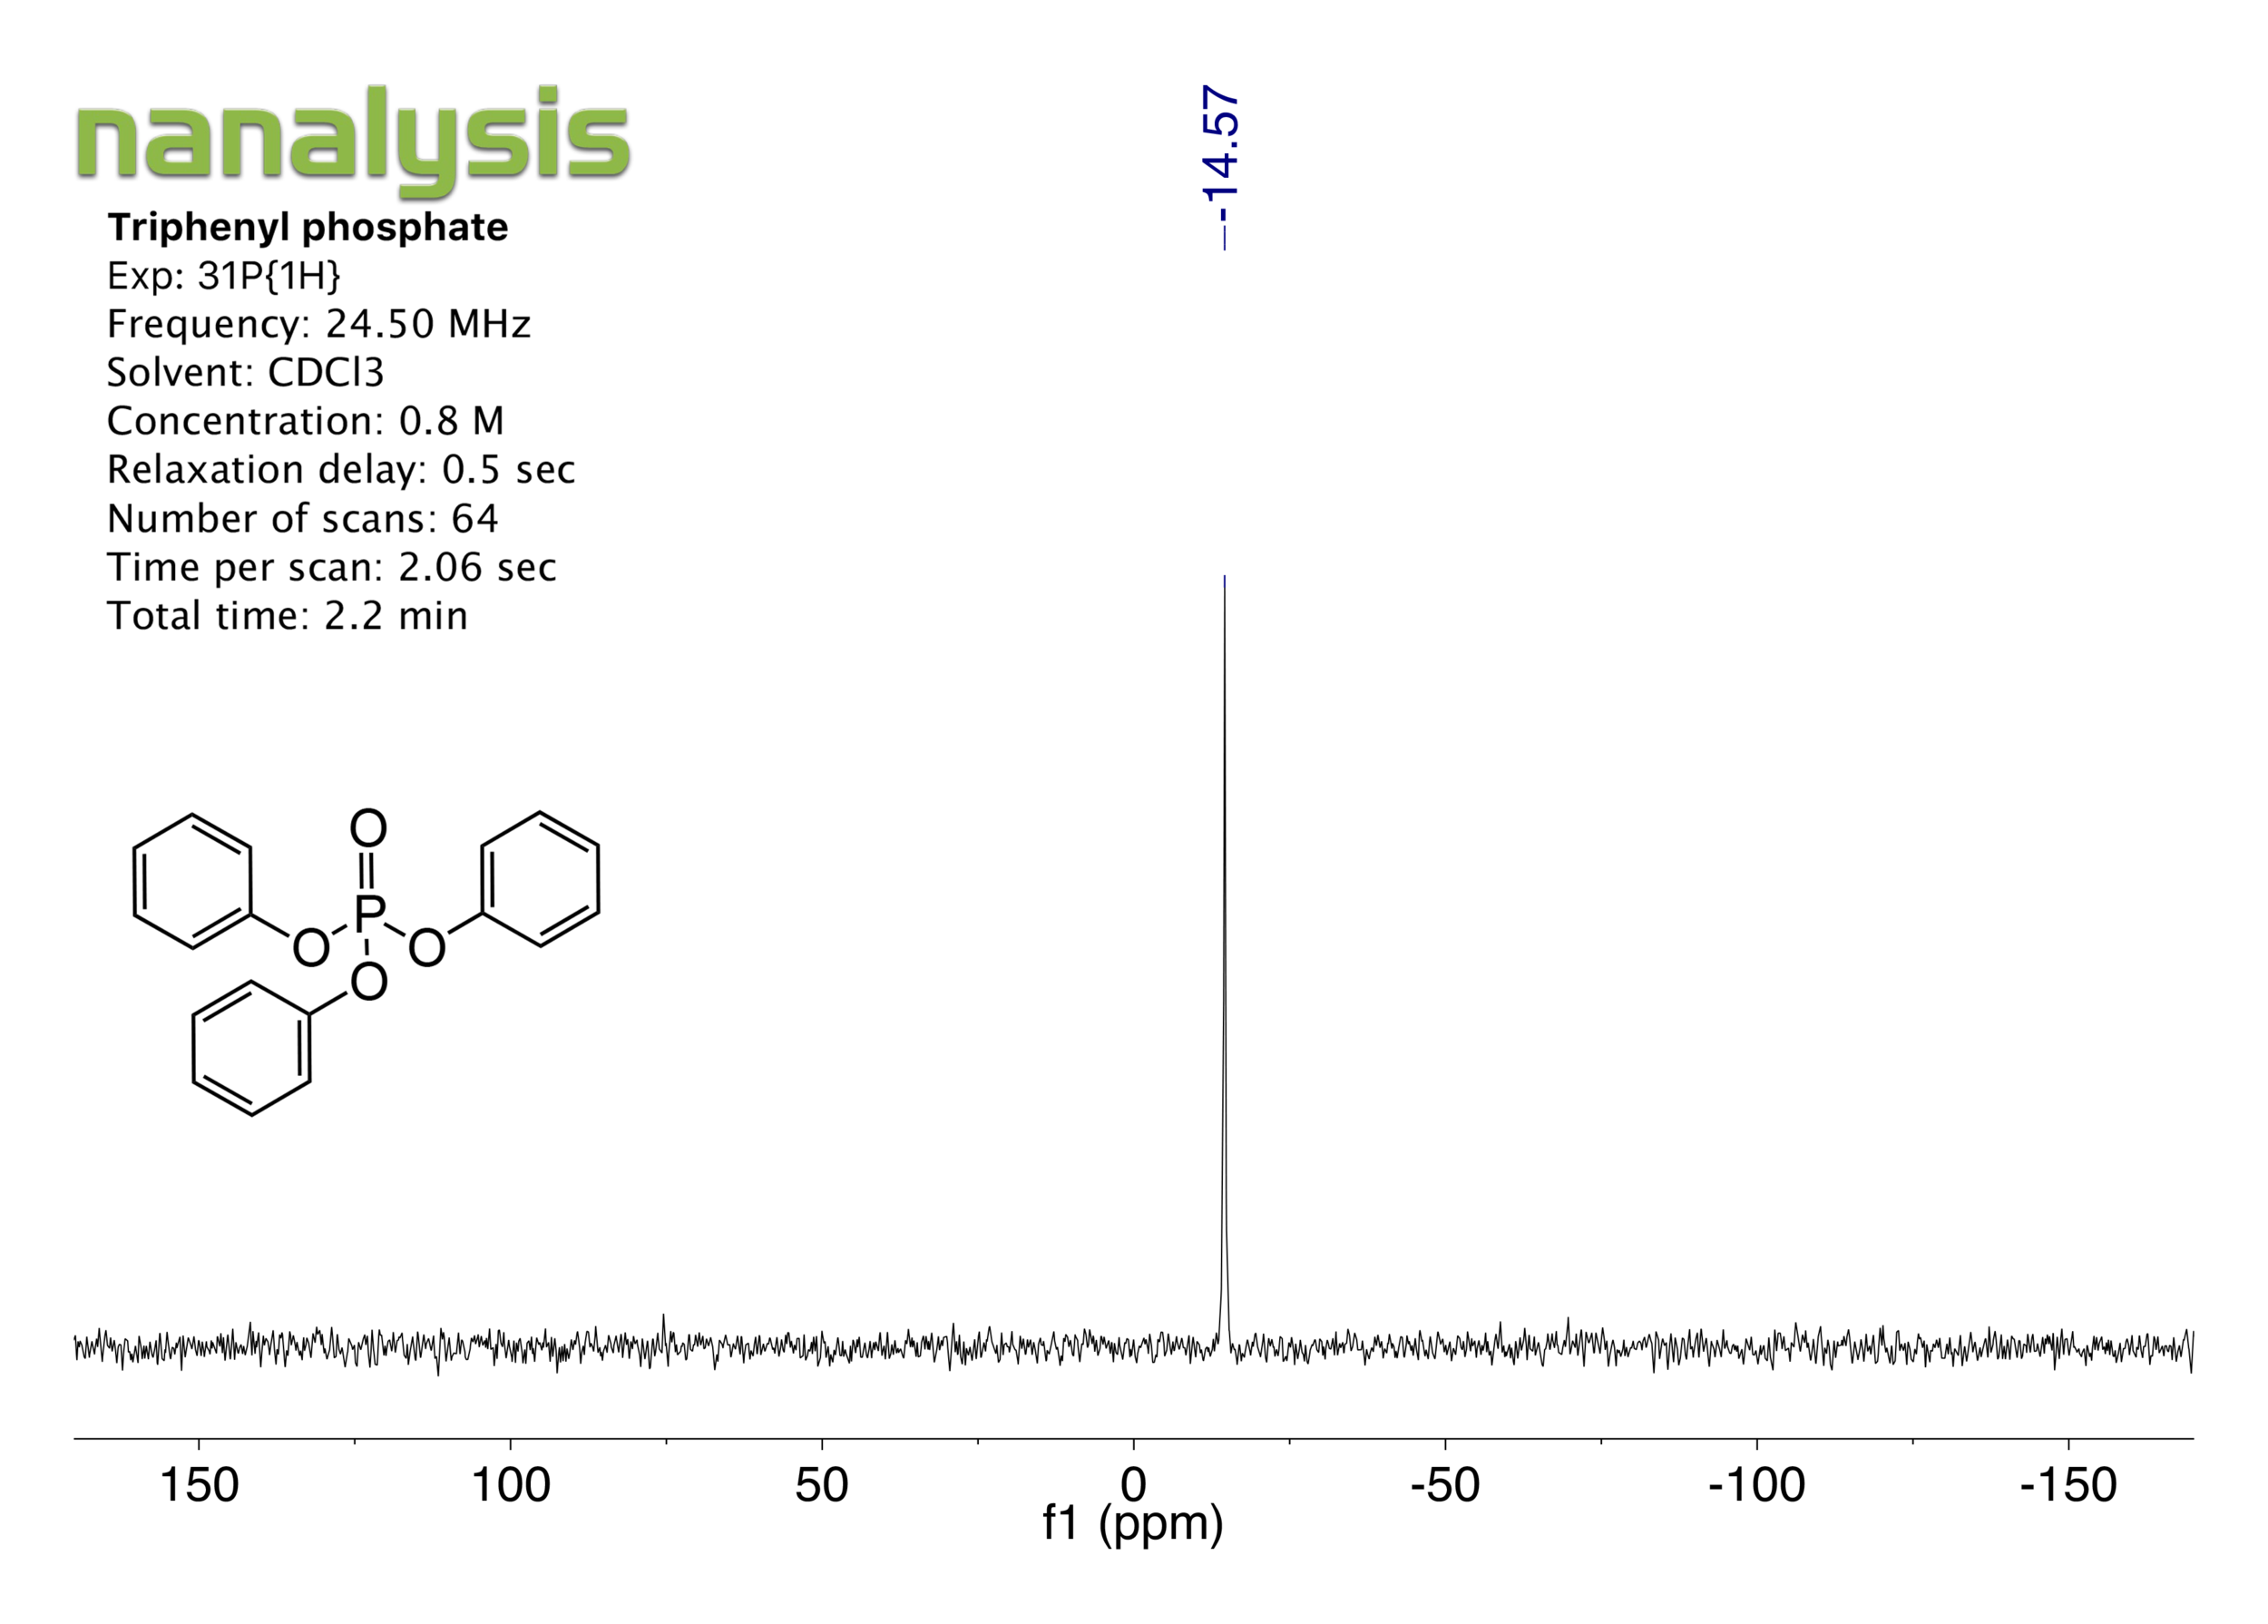 triphenylphosphate-2_31P_benchtopNMR.png